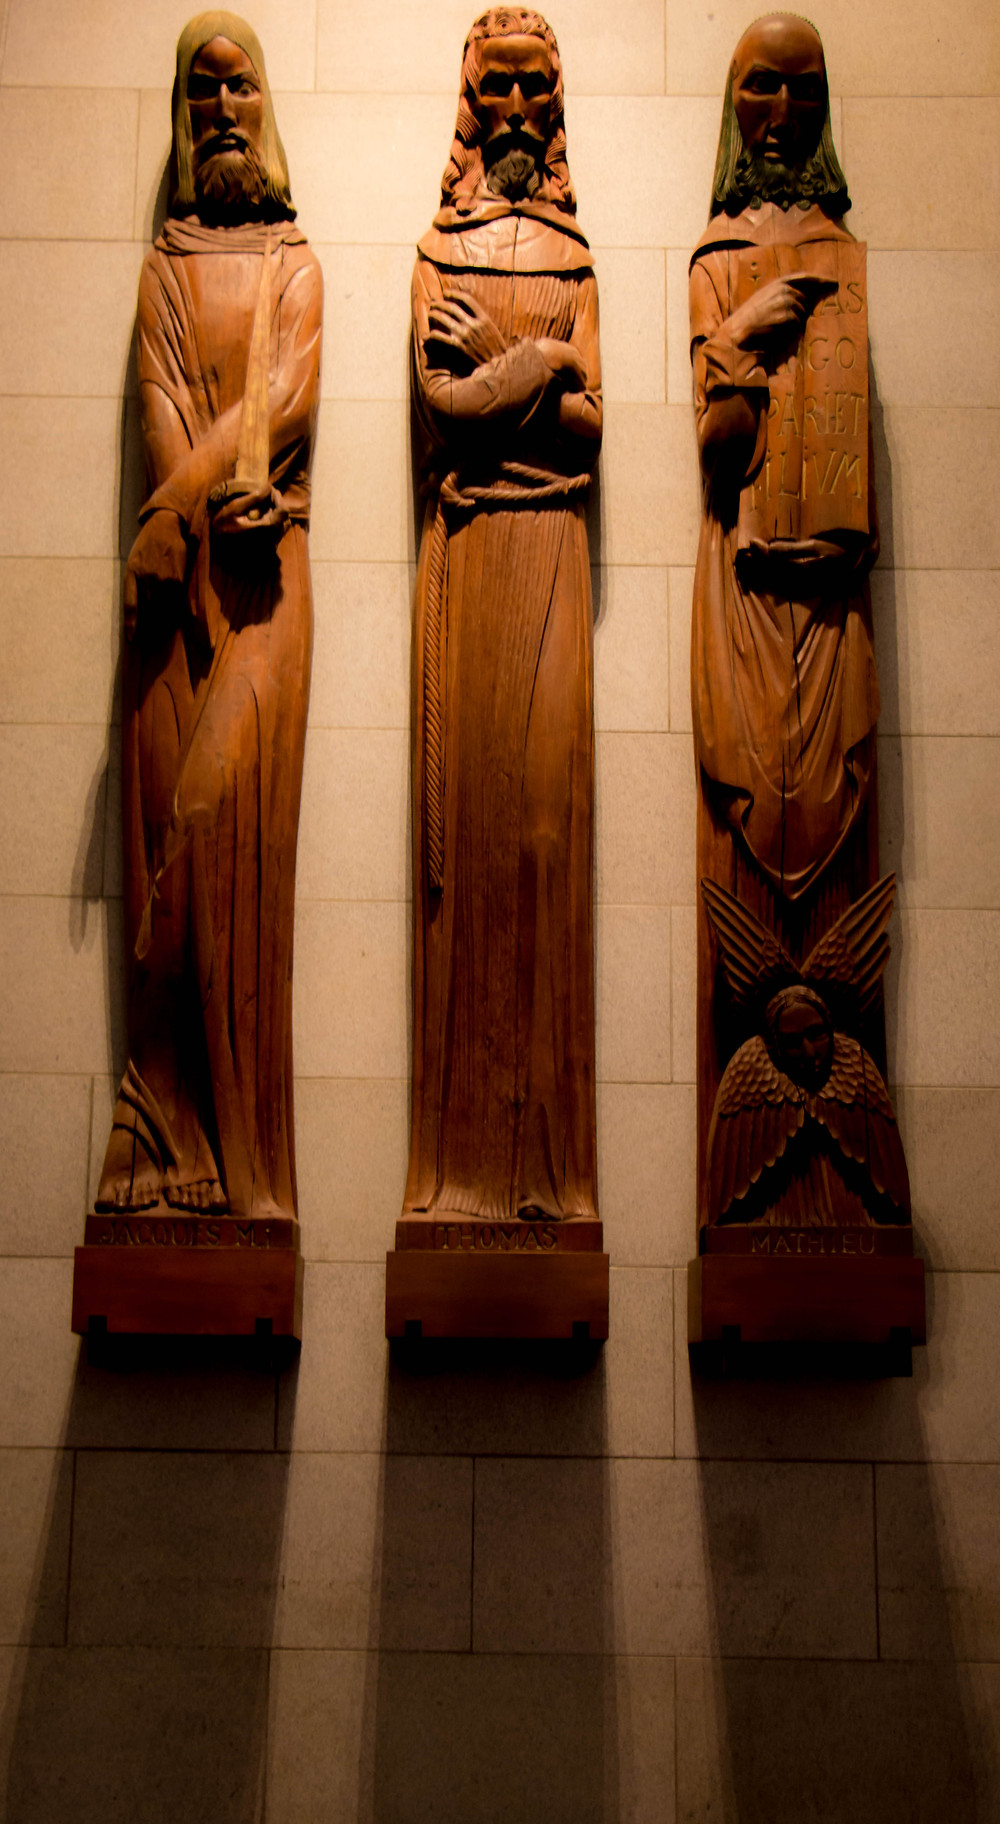 Three Apostles of Saint Joseph's Oratory